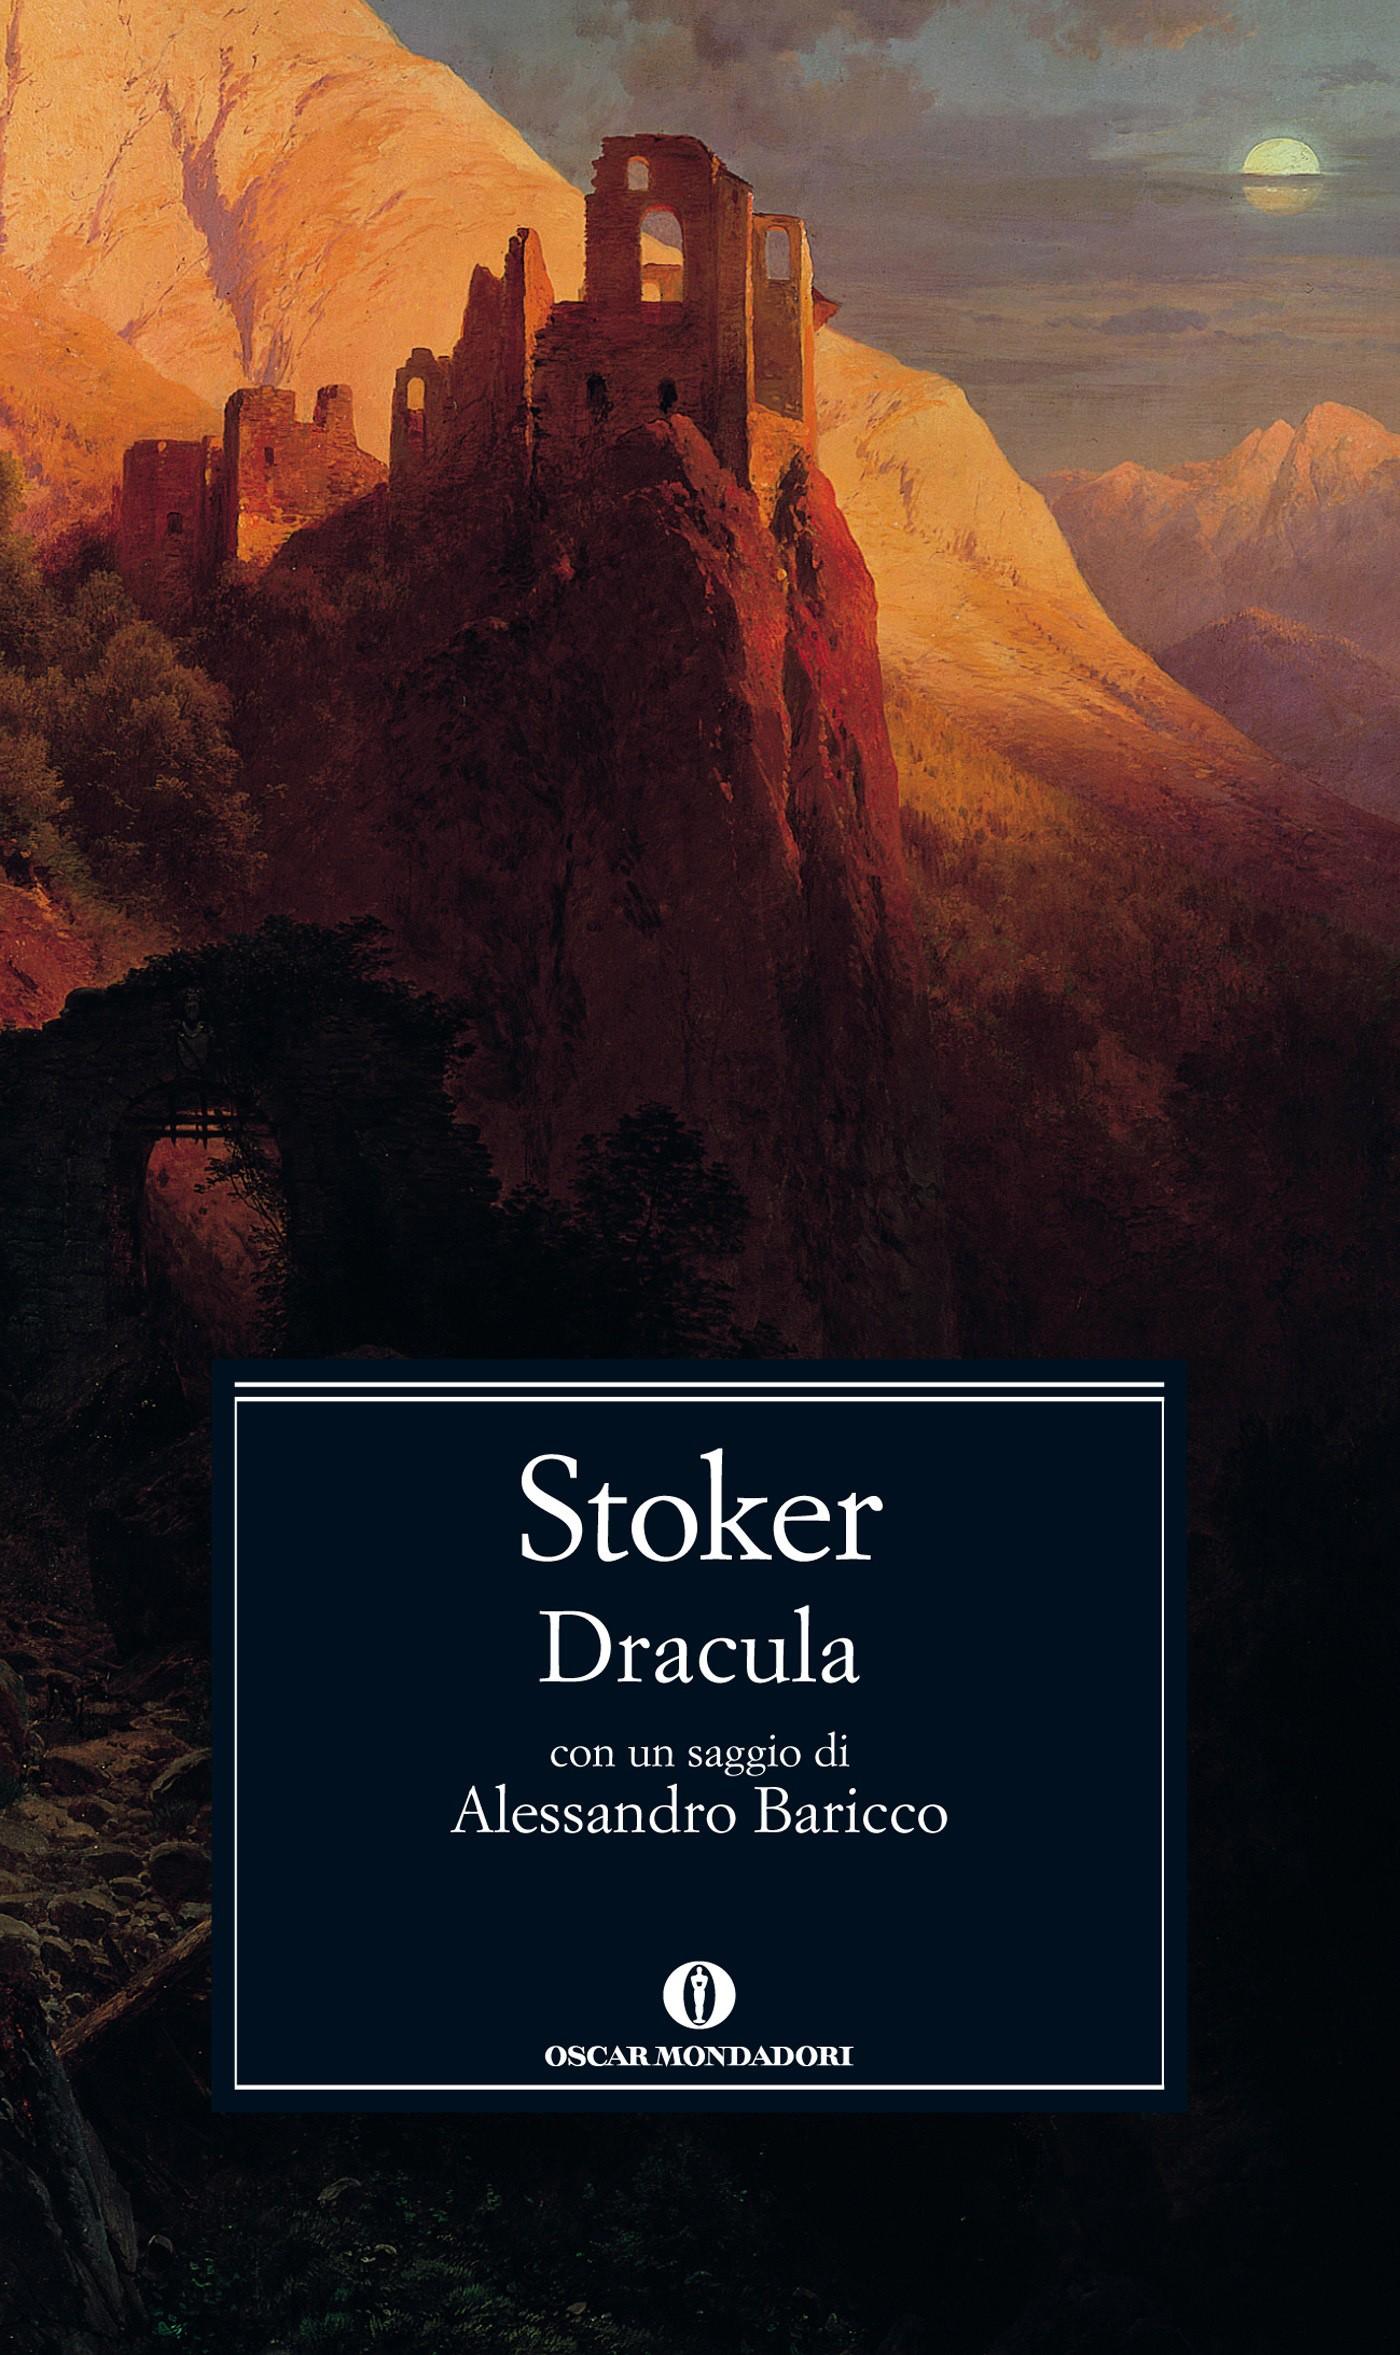 Bram Stoker, Dracula, Mondadori